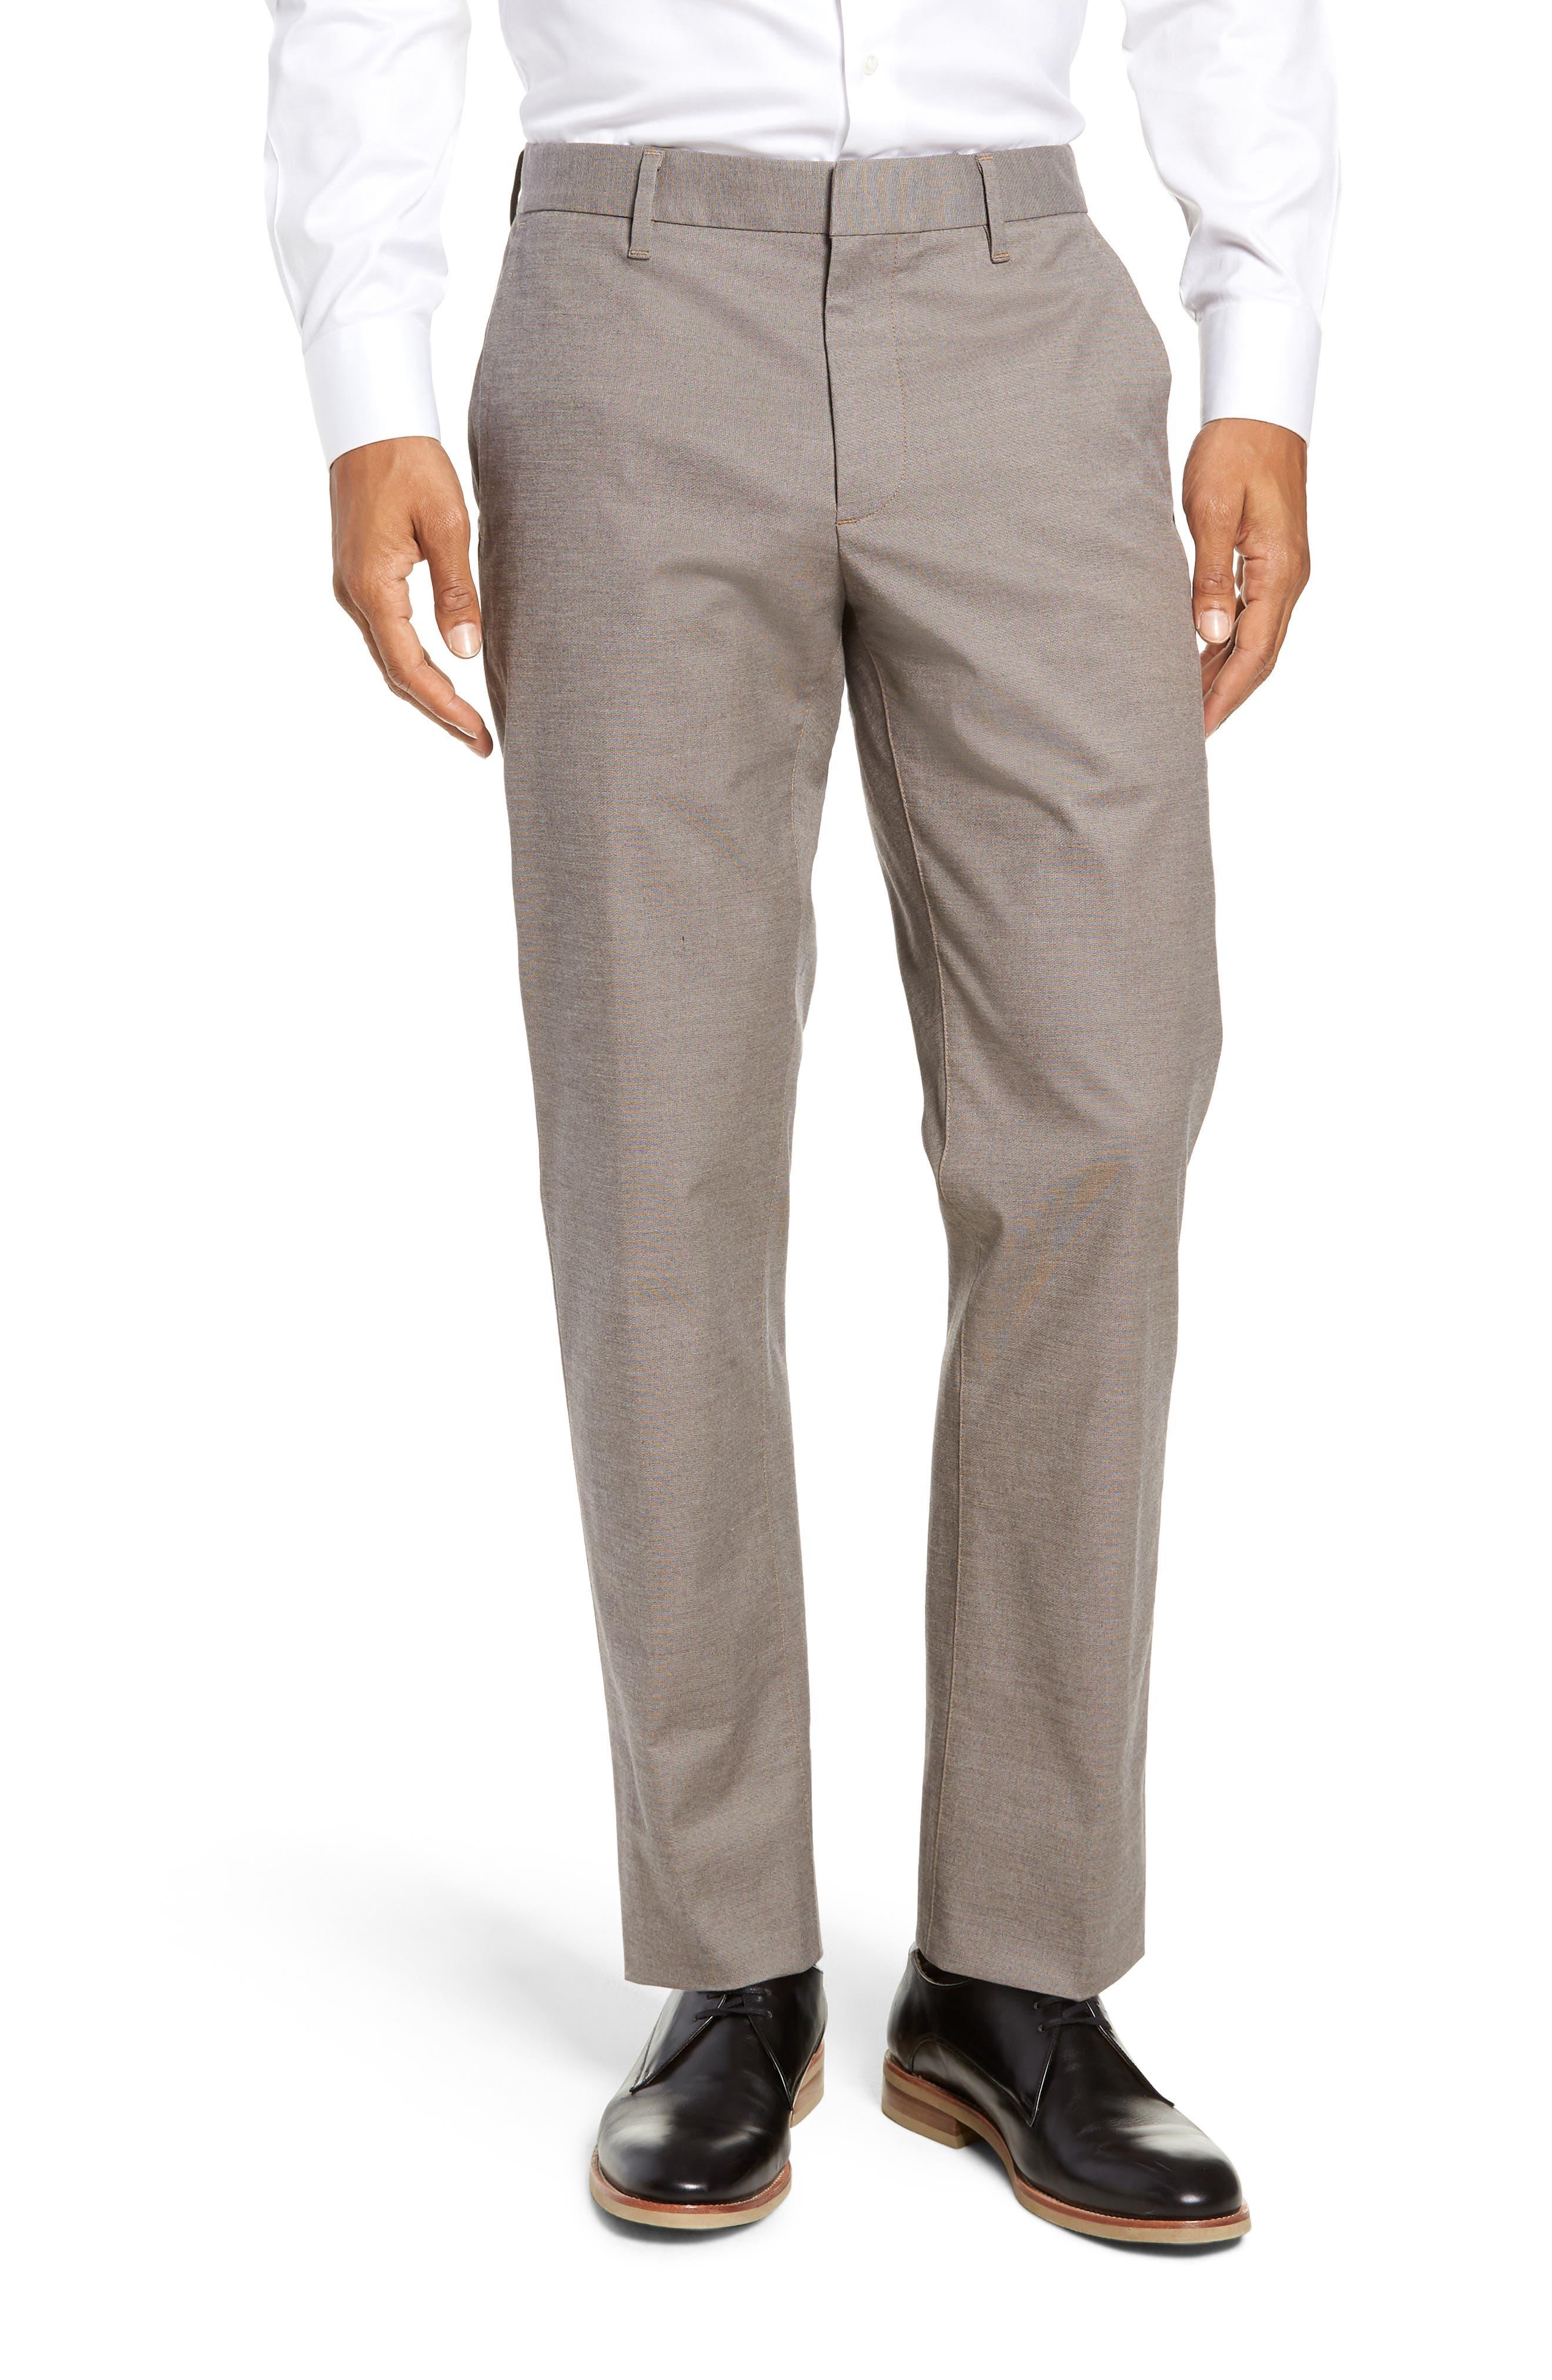 BONOBOS Weekday Warrior Slim Fit Stretch Dress Pants, Main, color, LIGHT KHAKI YARN DYE